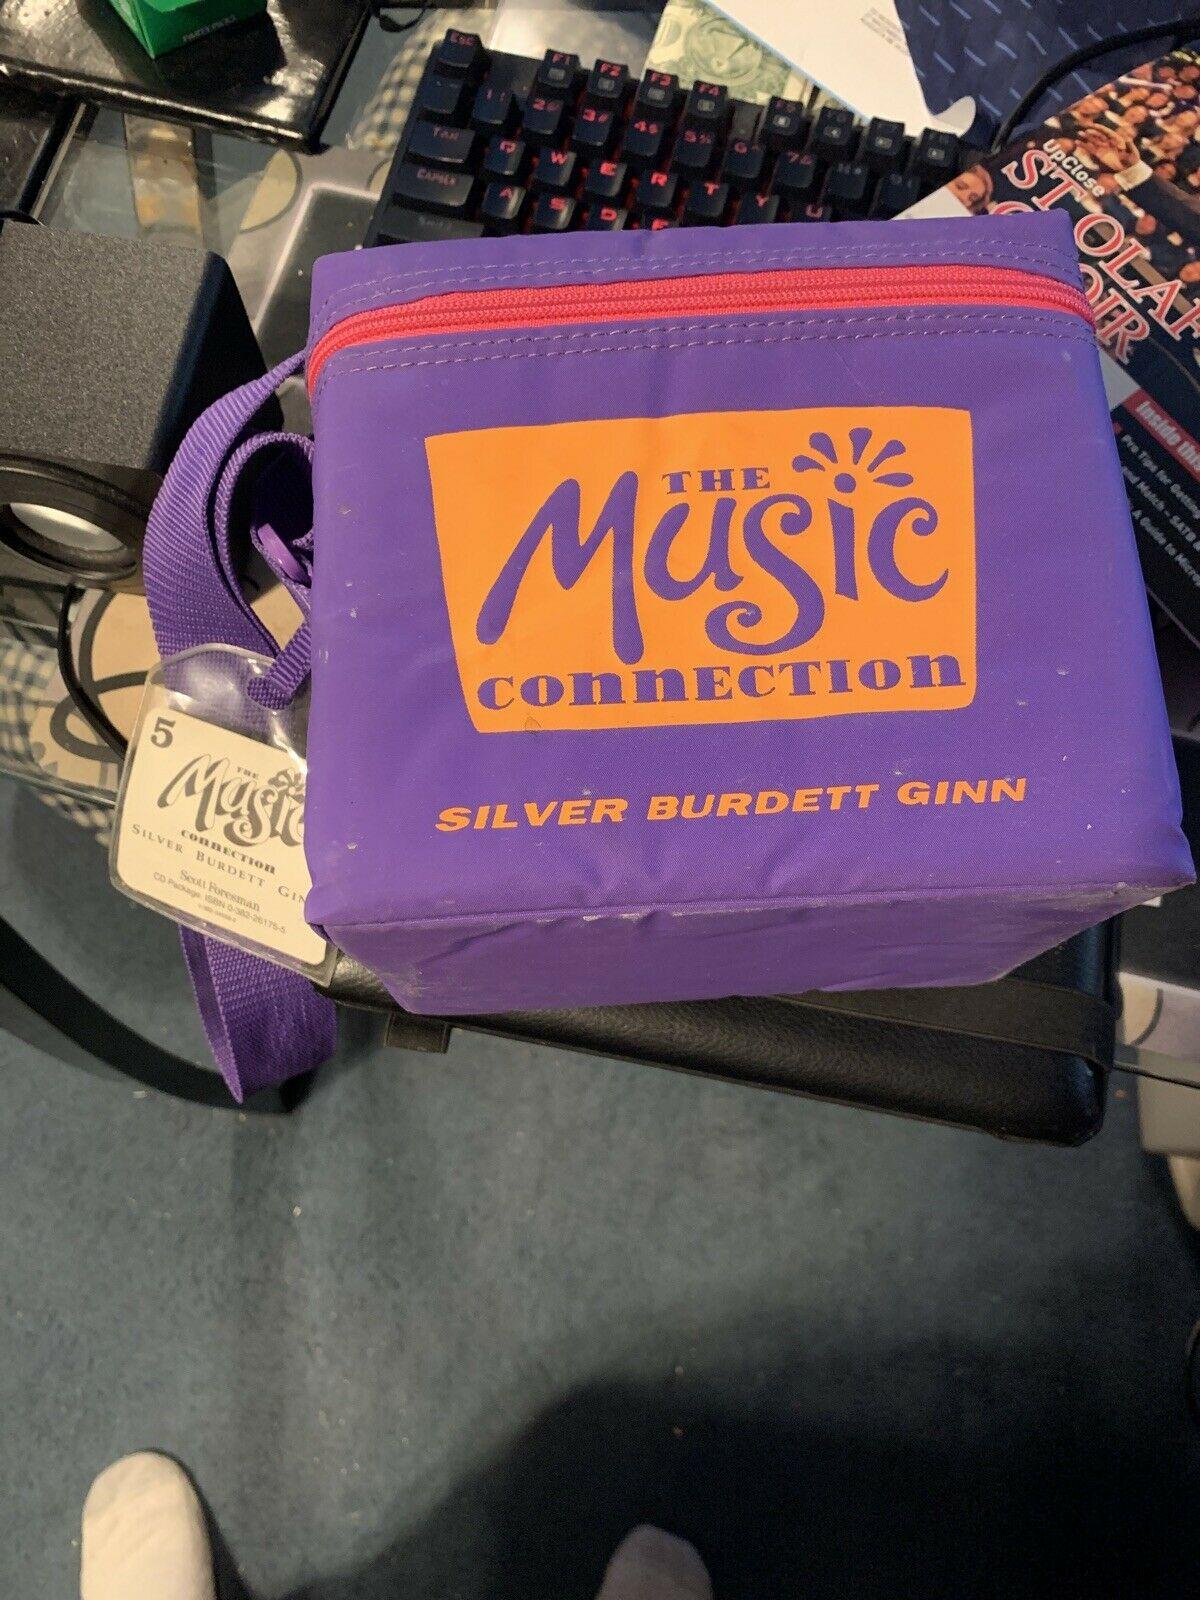 Silver Burdett Ginn The Music Connection 12 CD Set Fifth Grade Educational 1